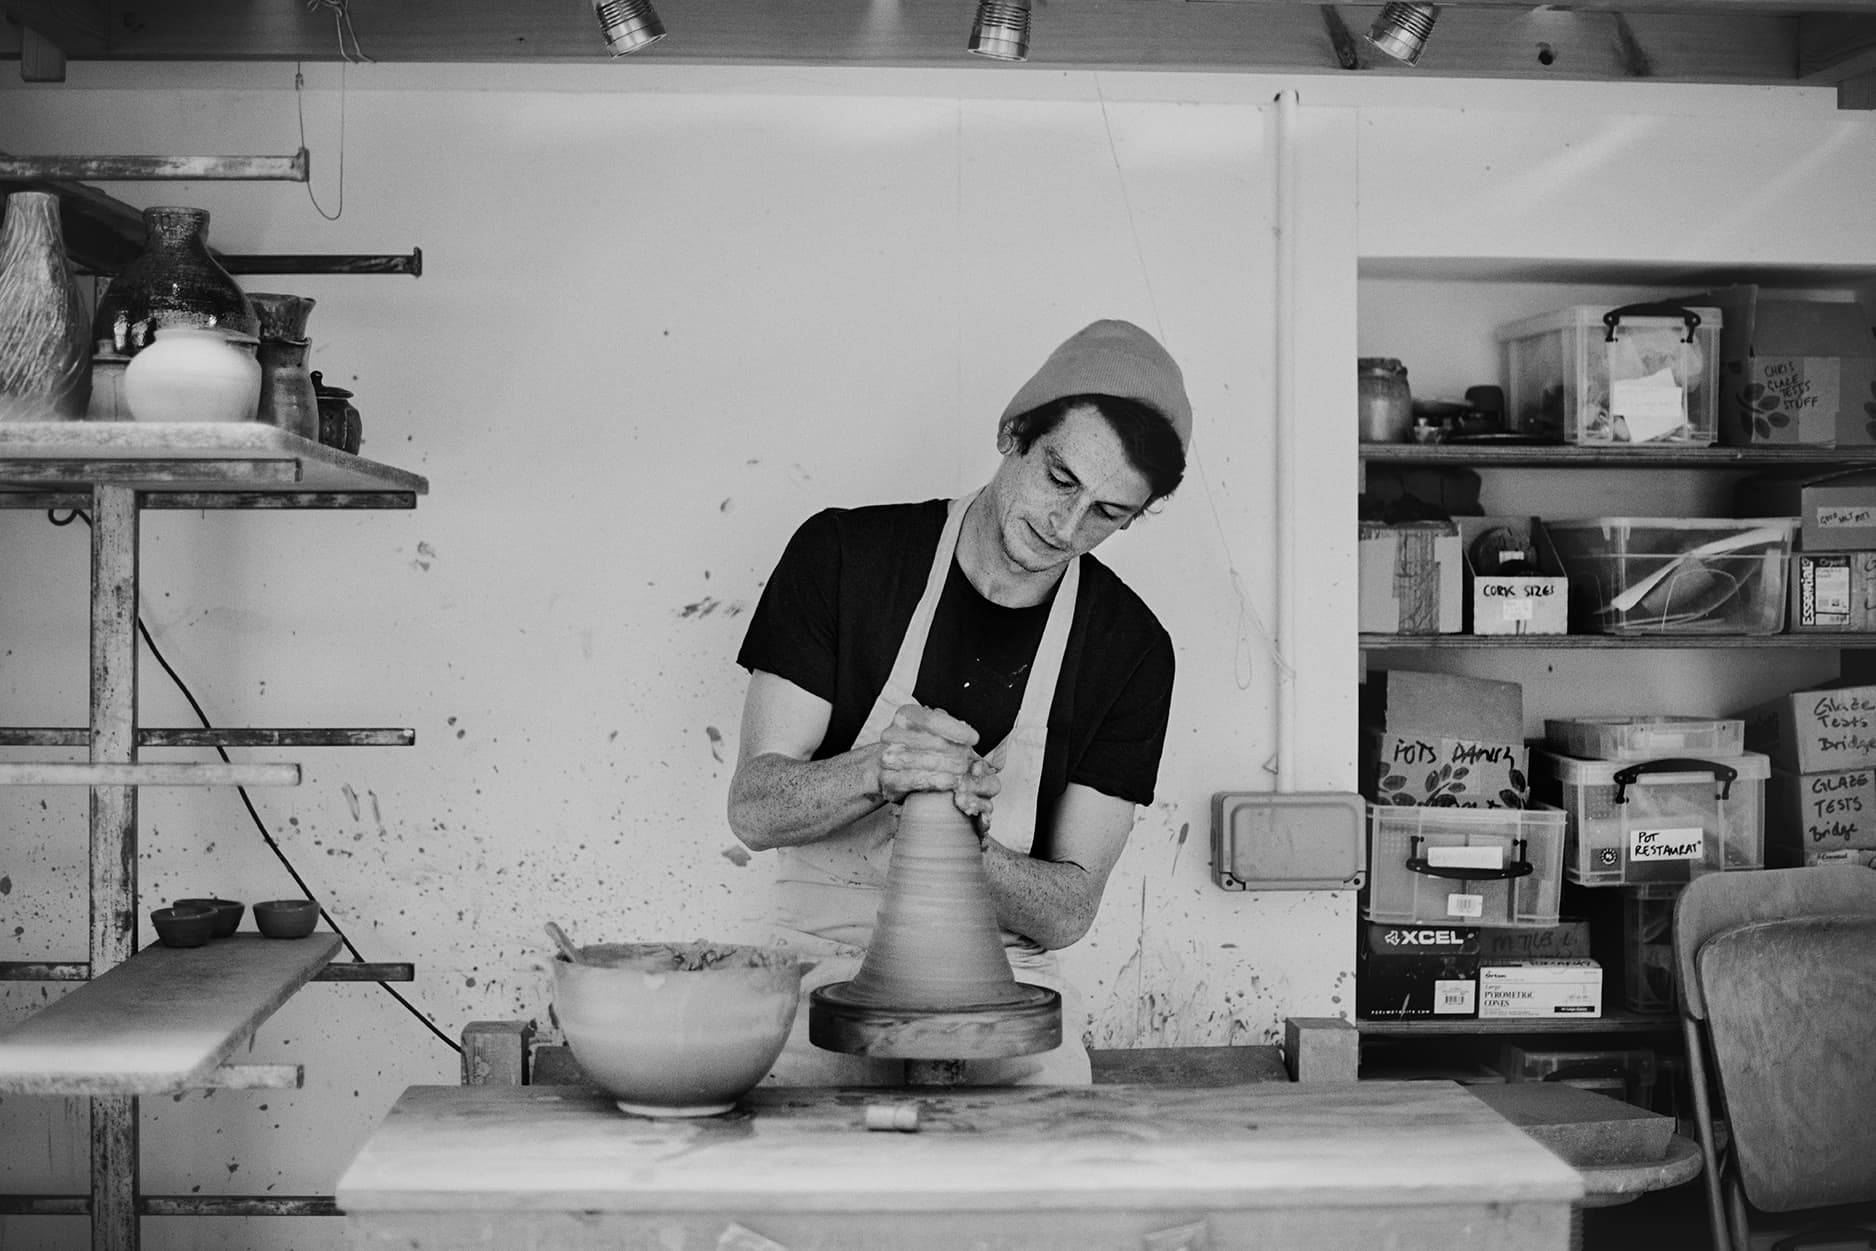 Man making a ceramic pot on a ceramic wheel, black and white image